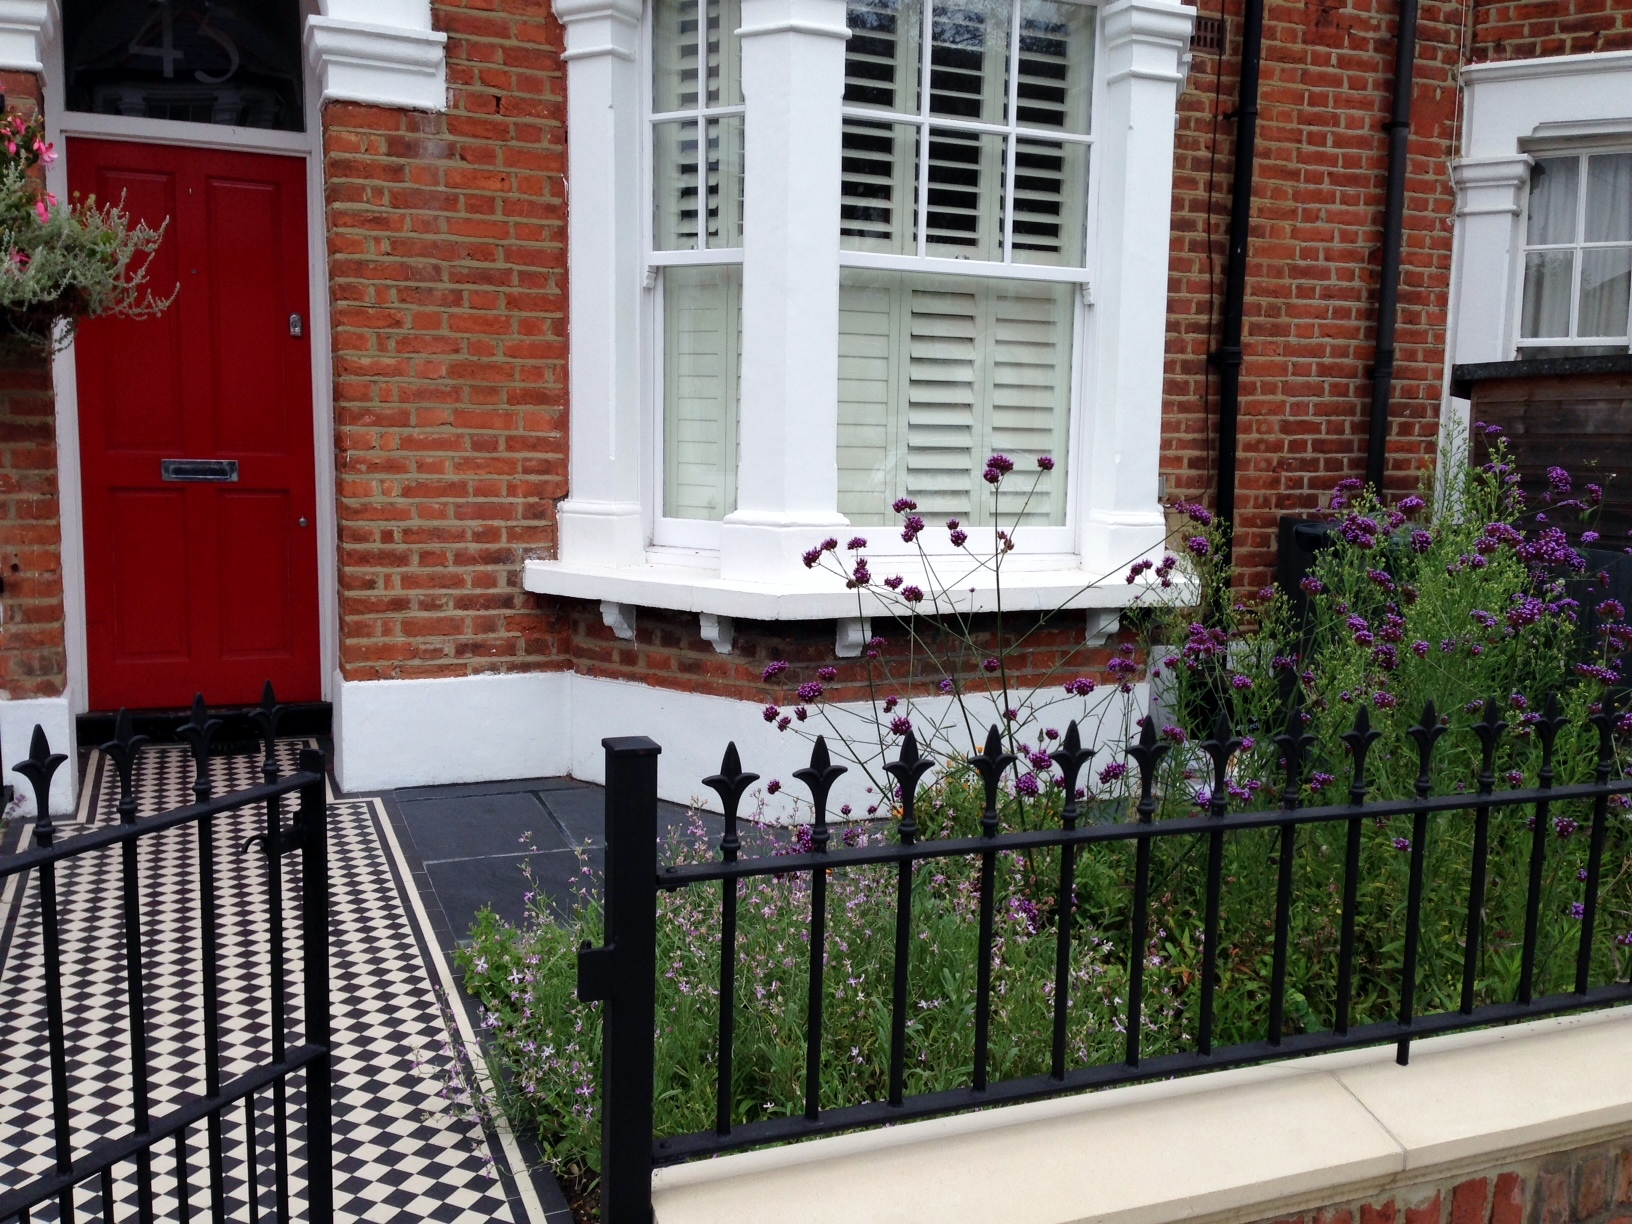 front wall rail garden mosaic victorian tile path balham london (3)